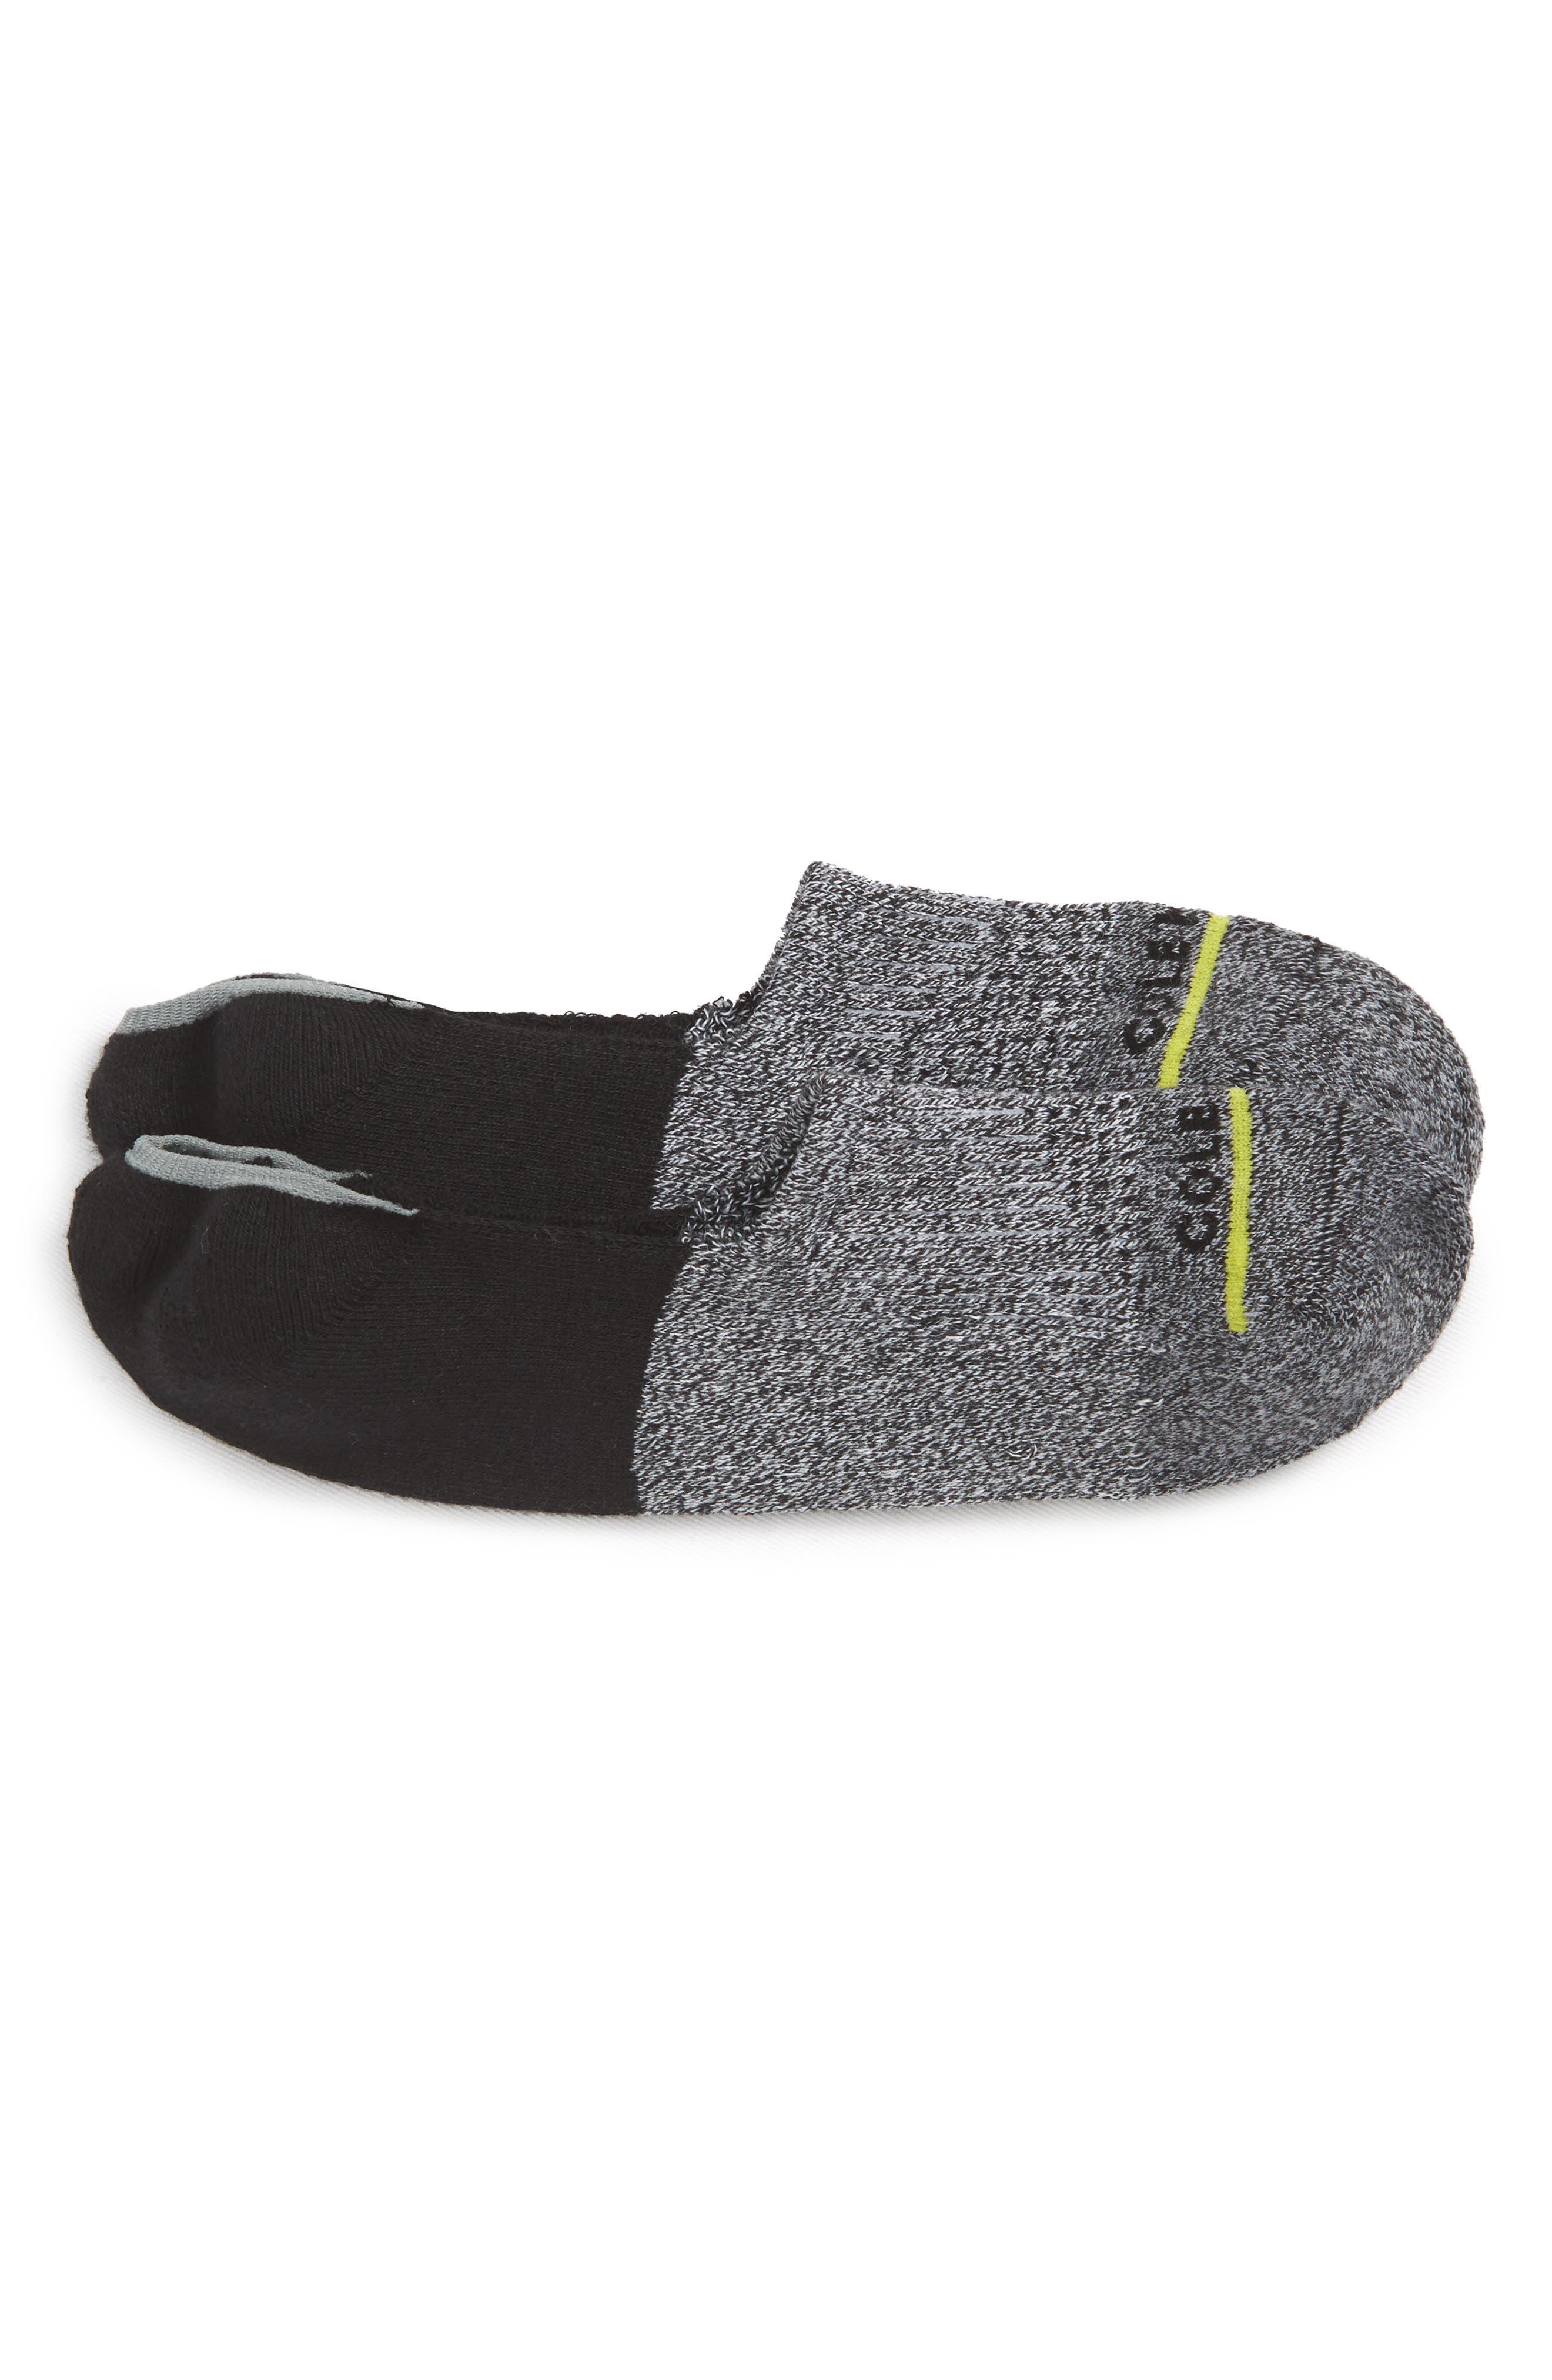 ZeroGrand Liner Socks,                         Main,                         color, 001